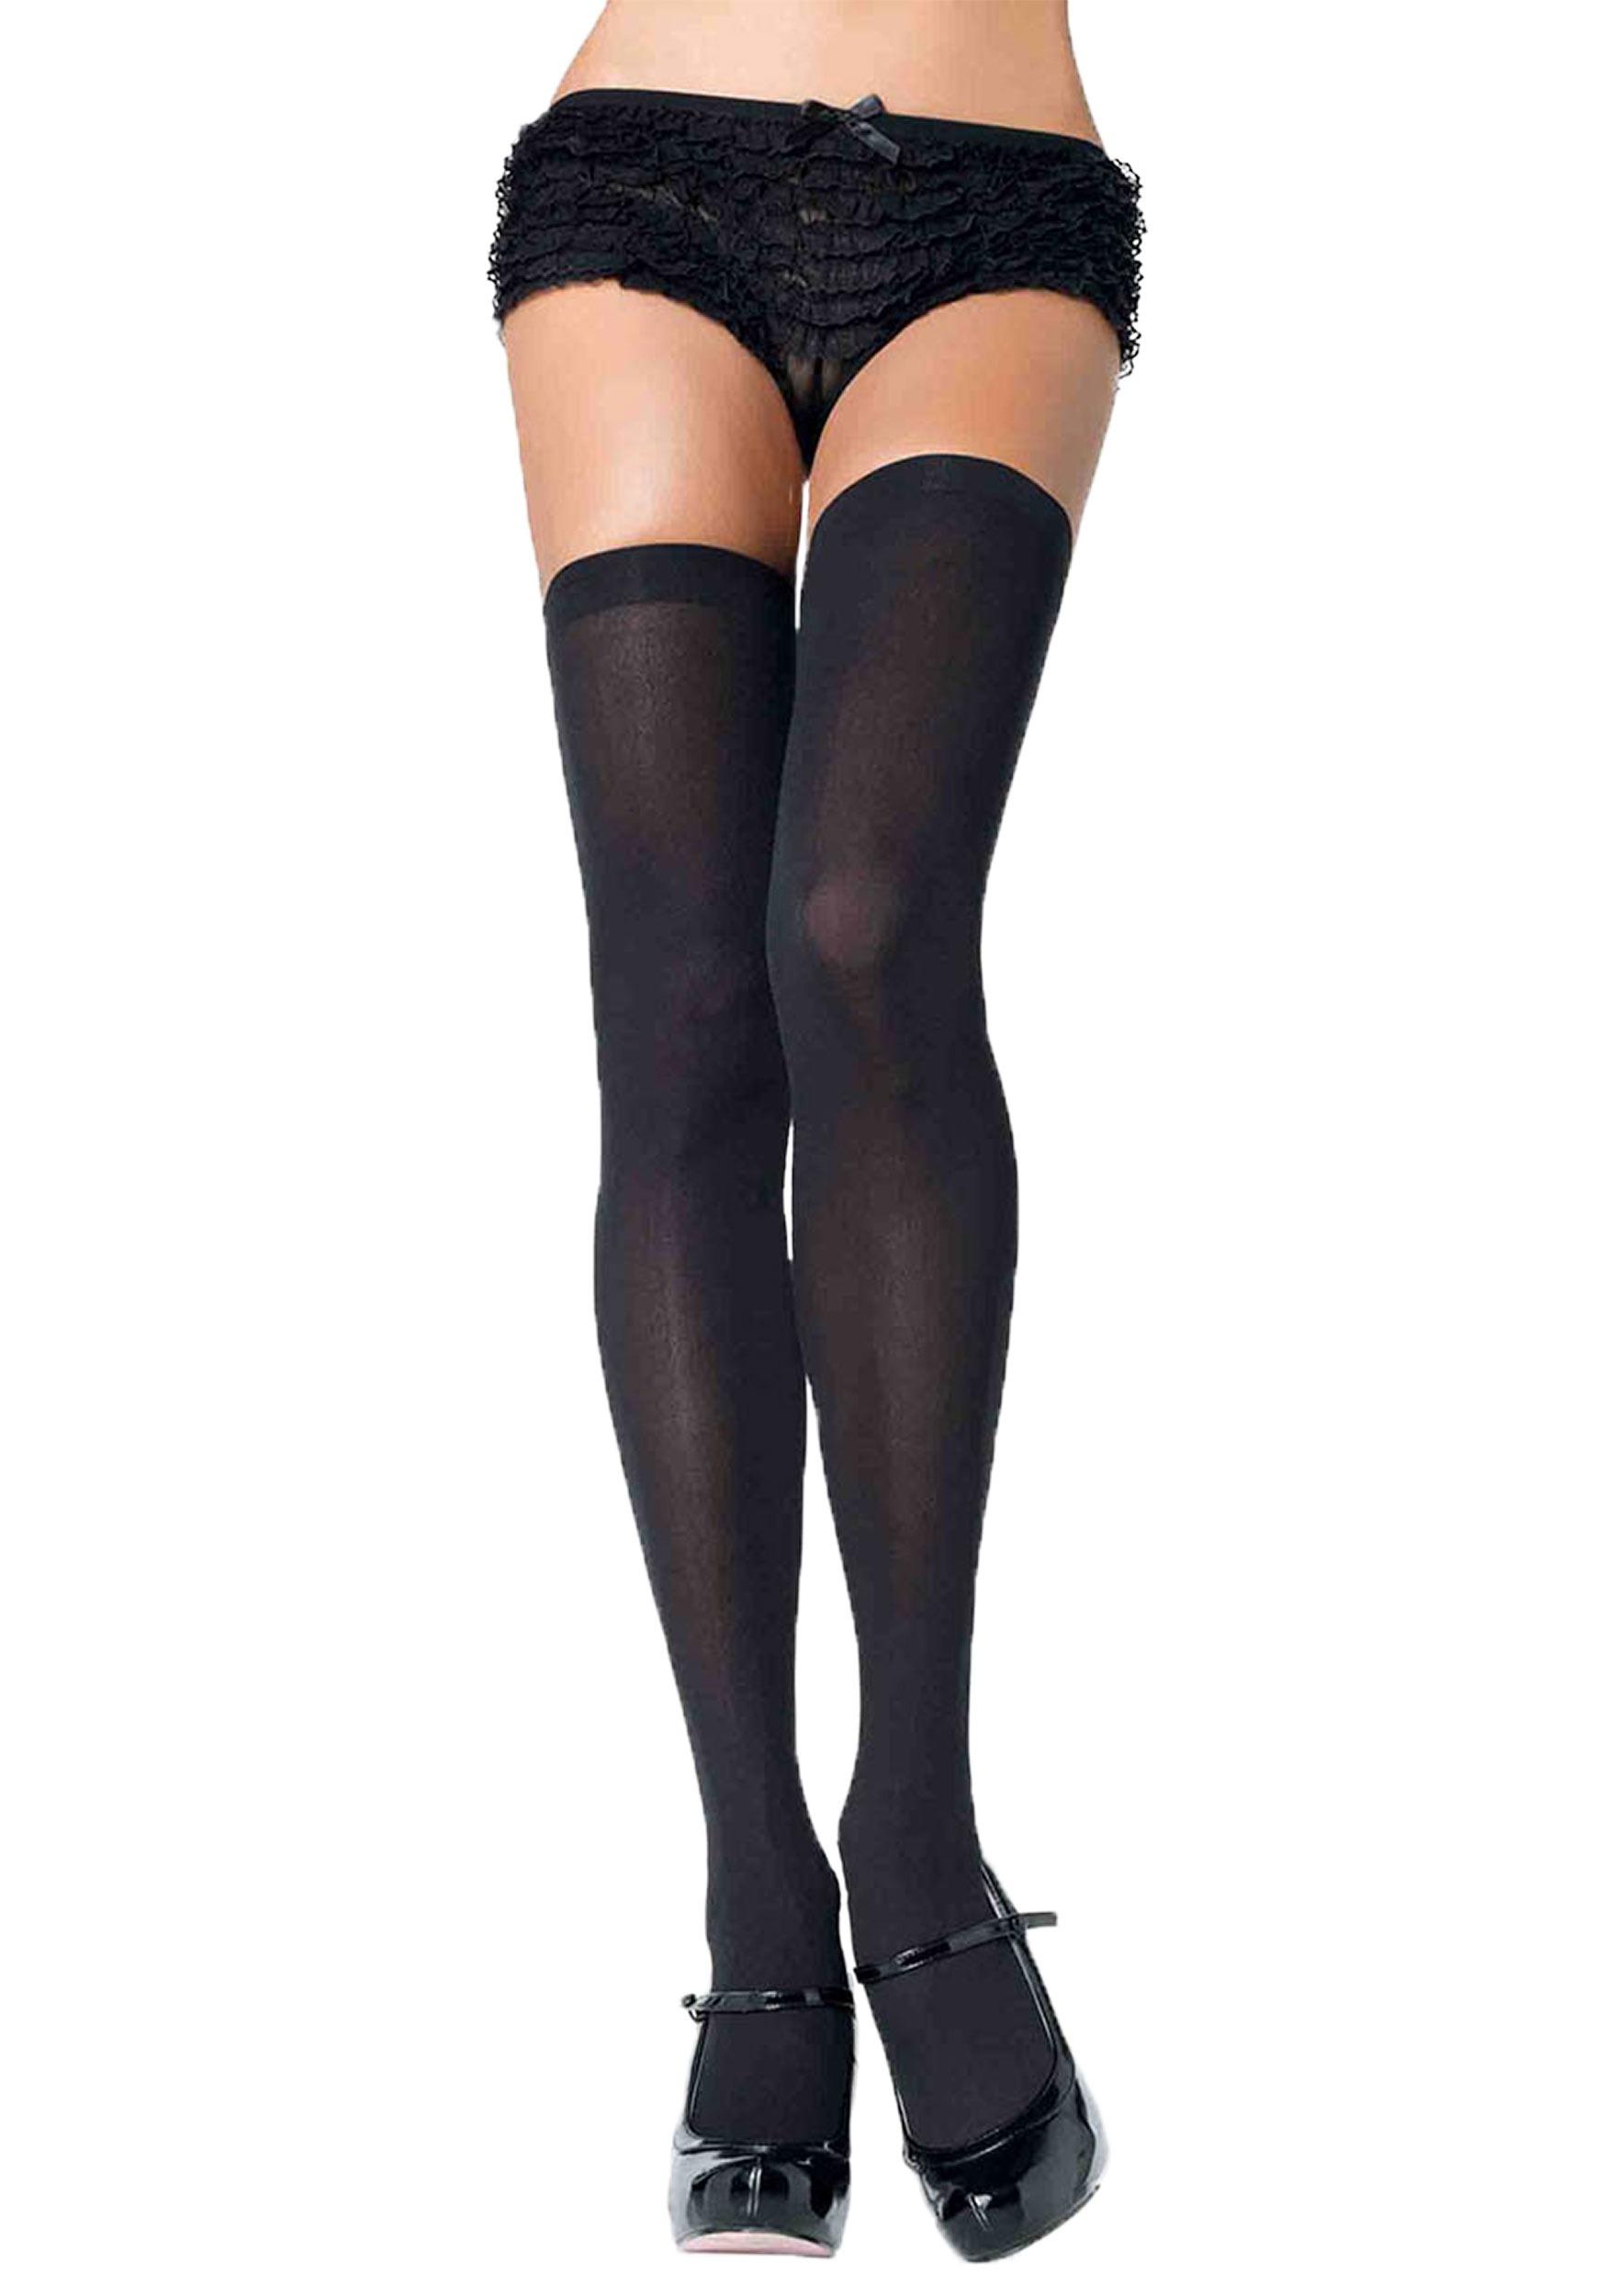 a682c57647713 black-thigh-high-stockings.jpg